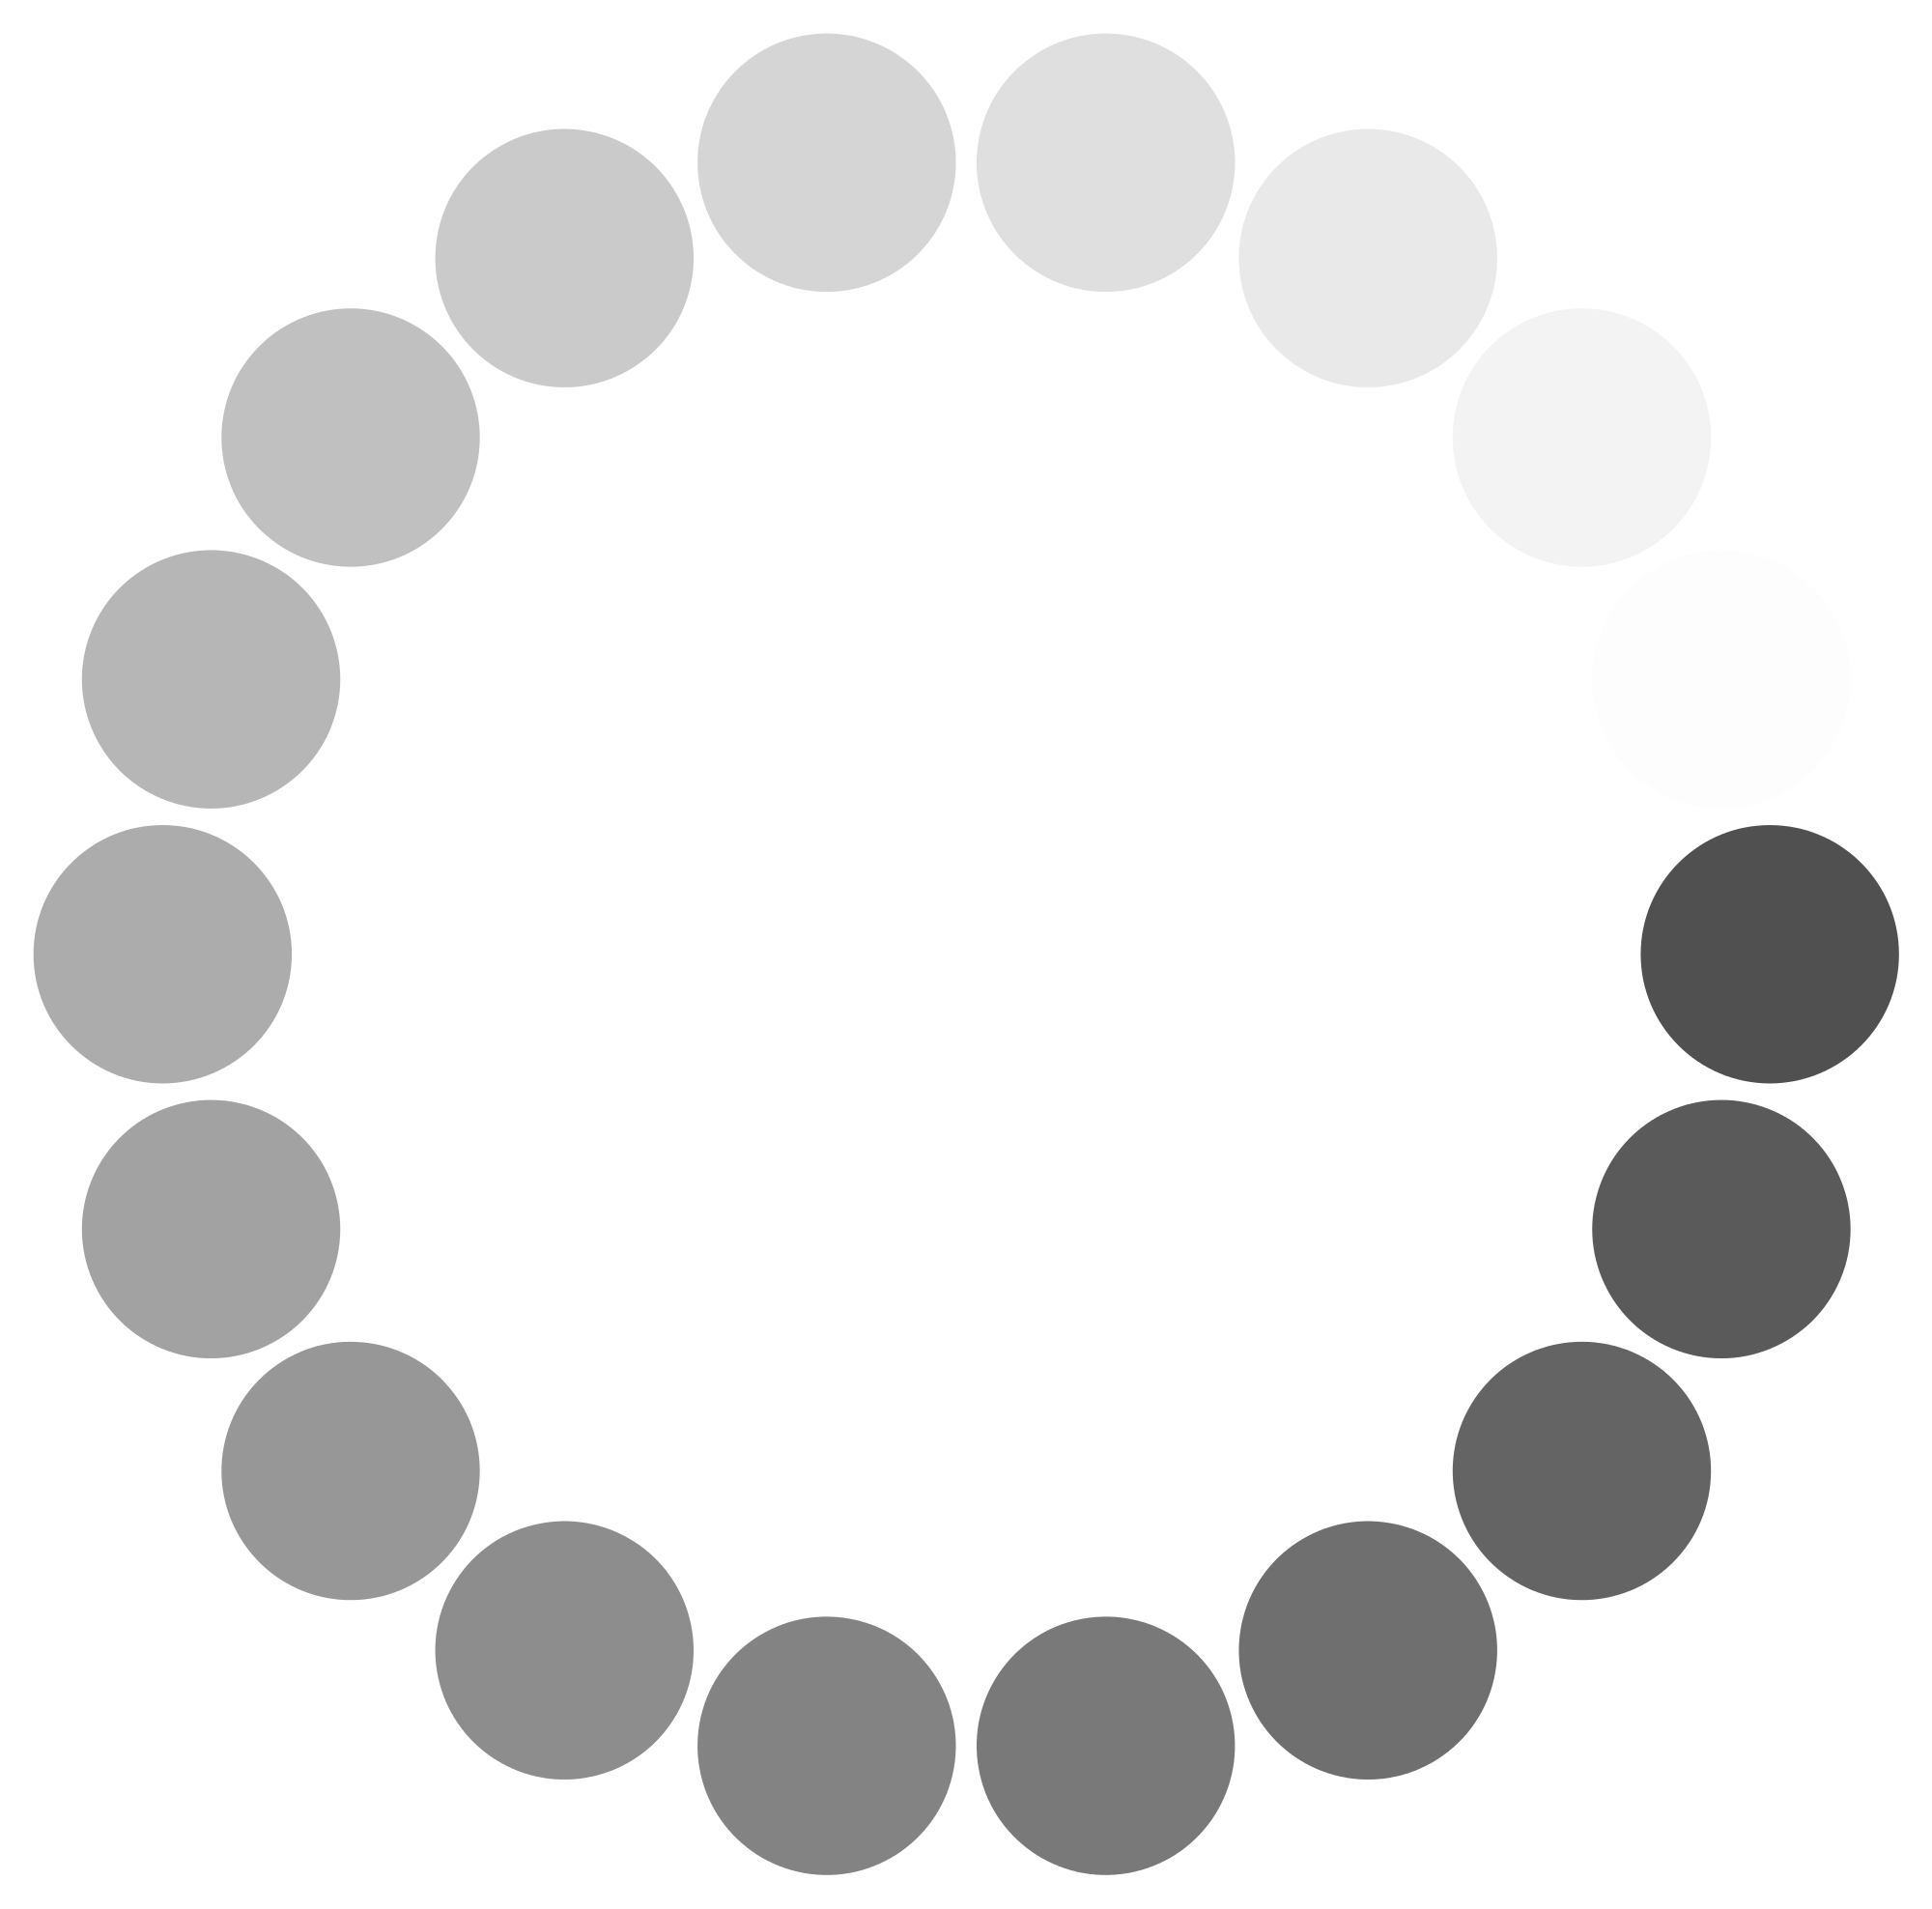 2000x1976 Filegray Circles.svg